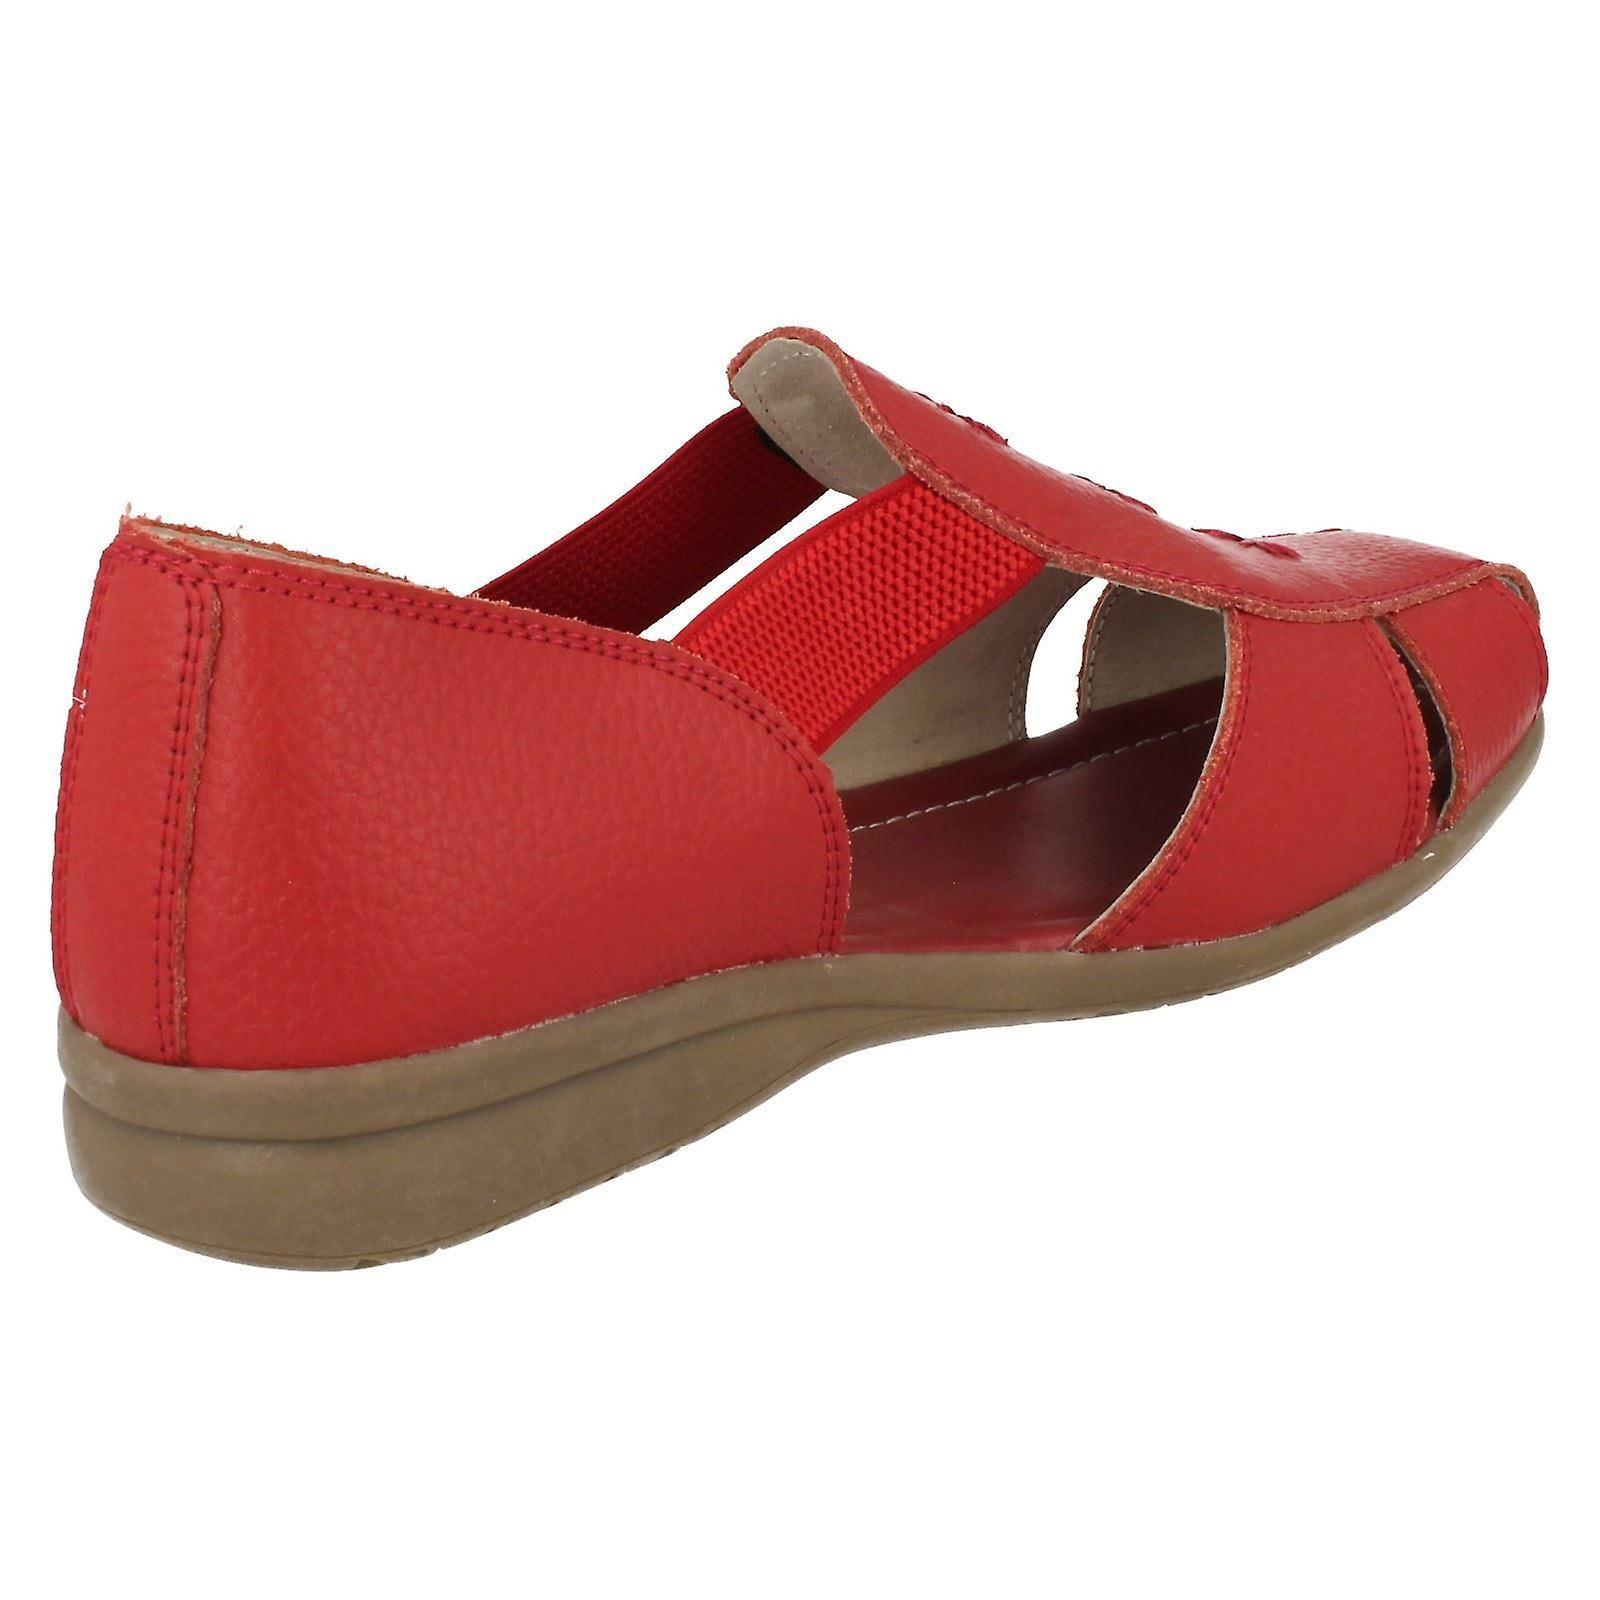 Ladies Lifestyle Casual Summer Shoes Harrogate